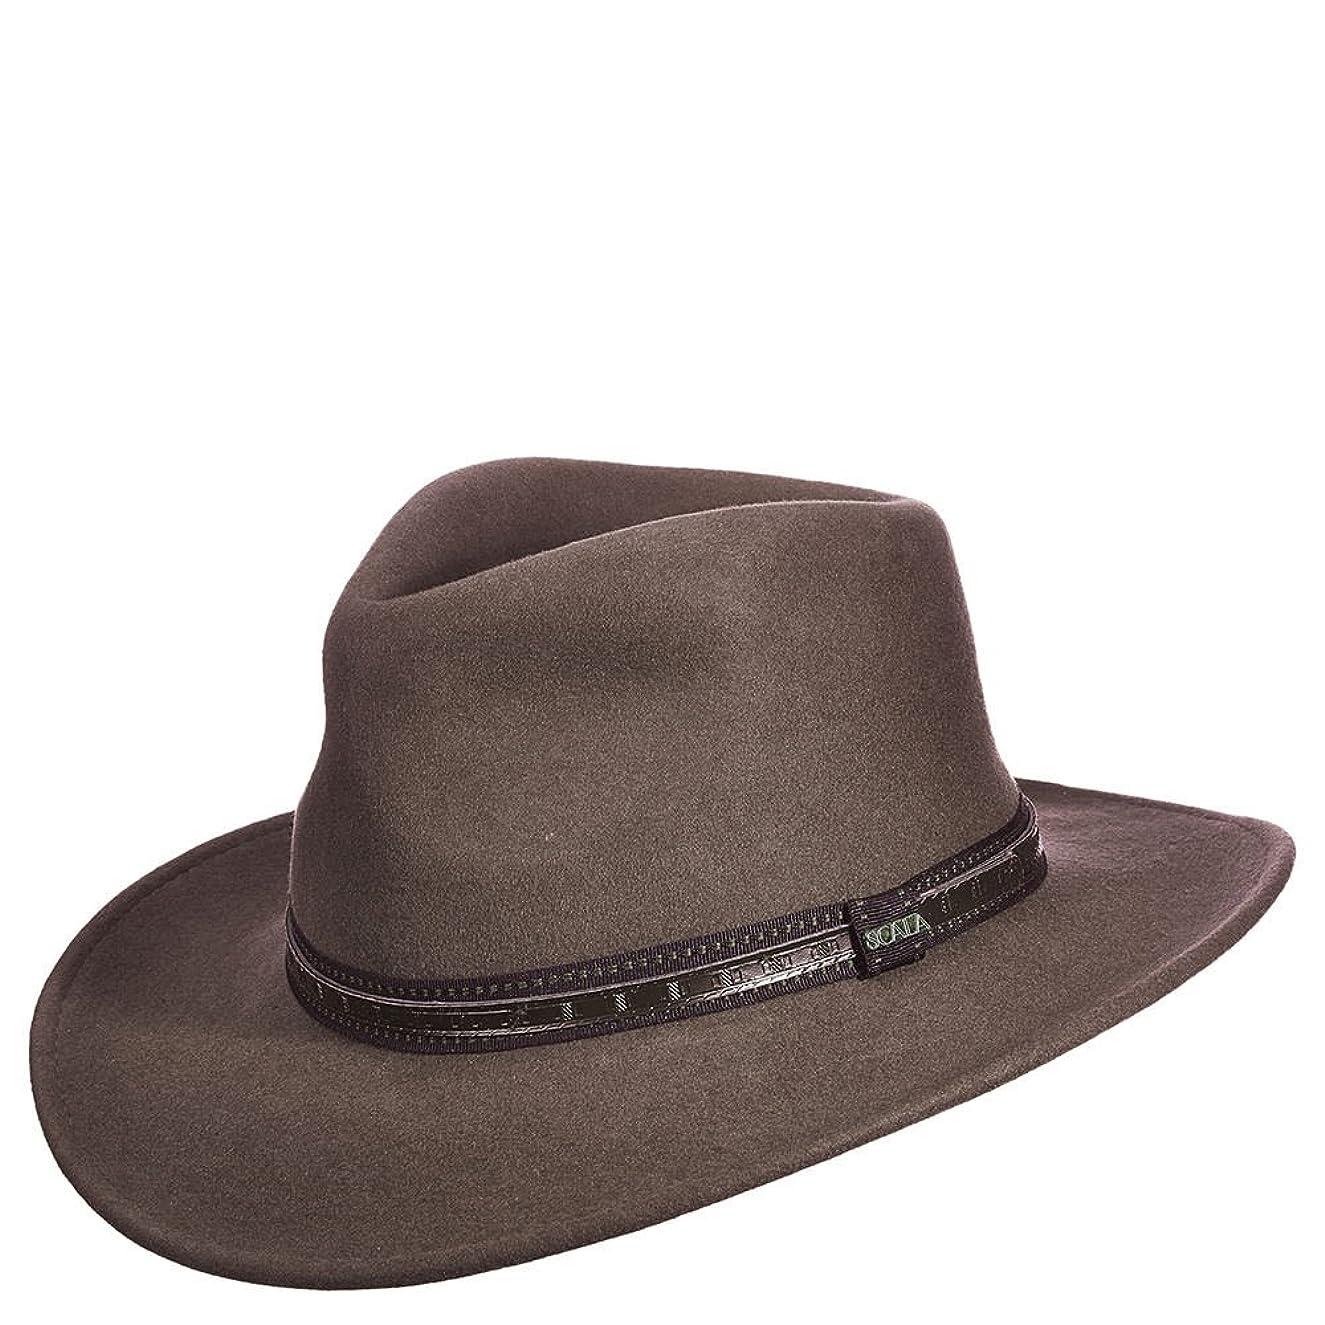 8977066ff7f236 Roxy Junior's Castro Hat ujlvb845918 - tembredecarteret.com